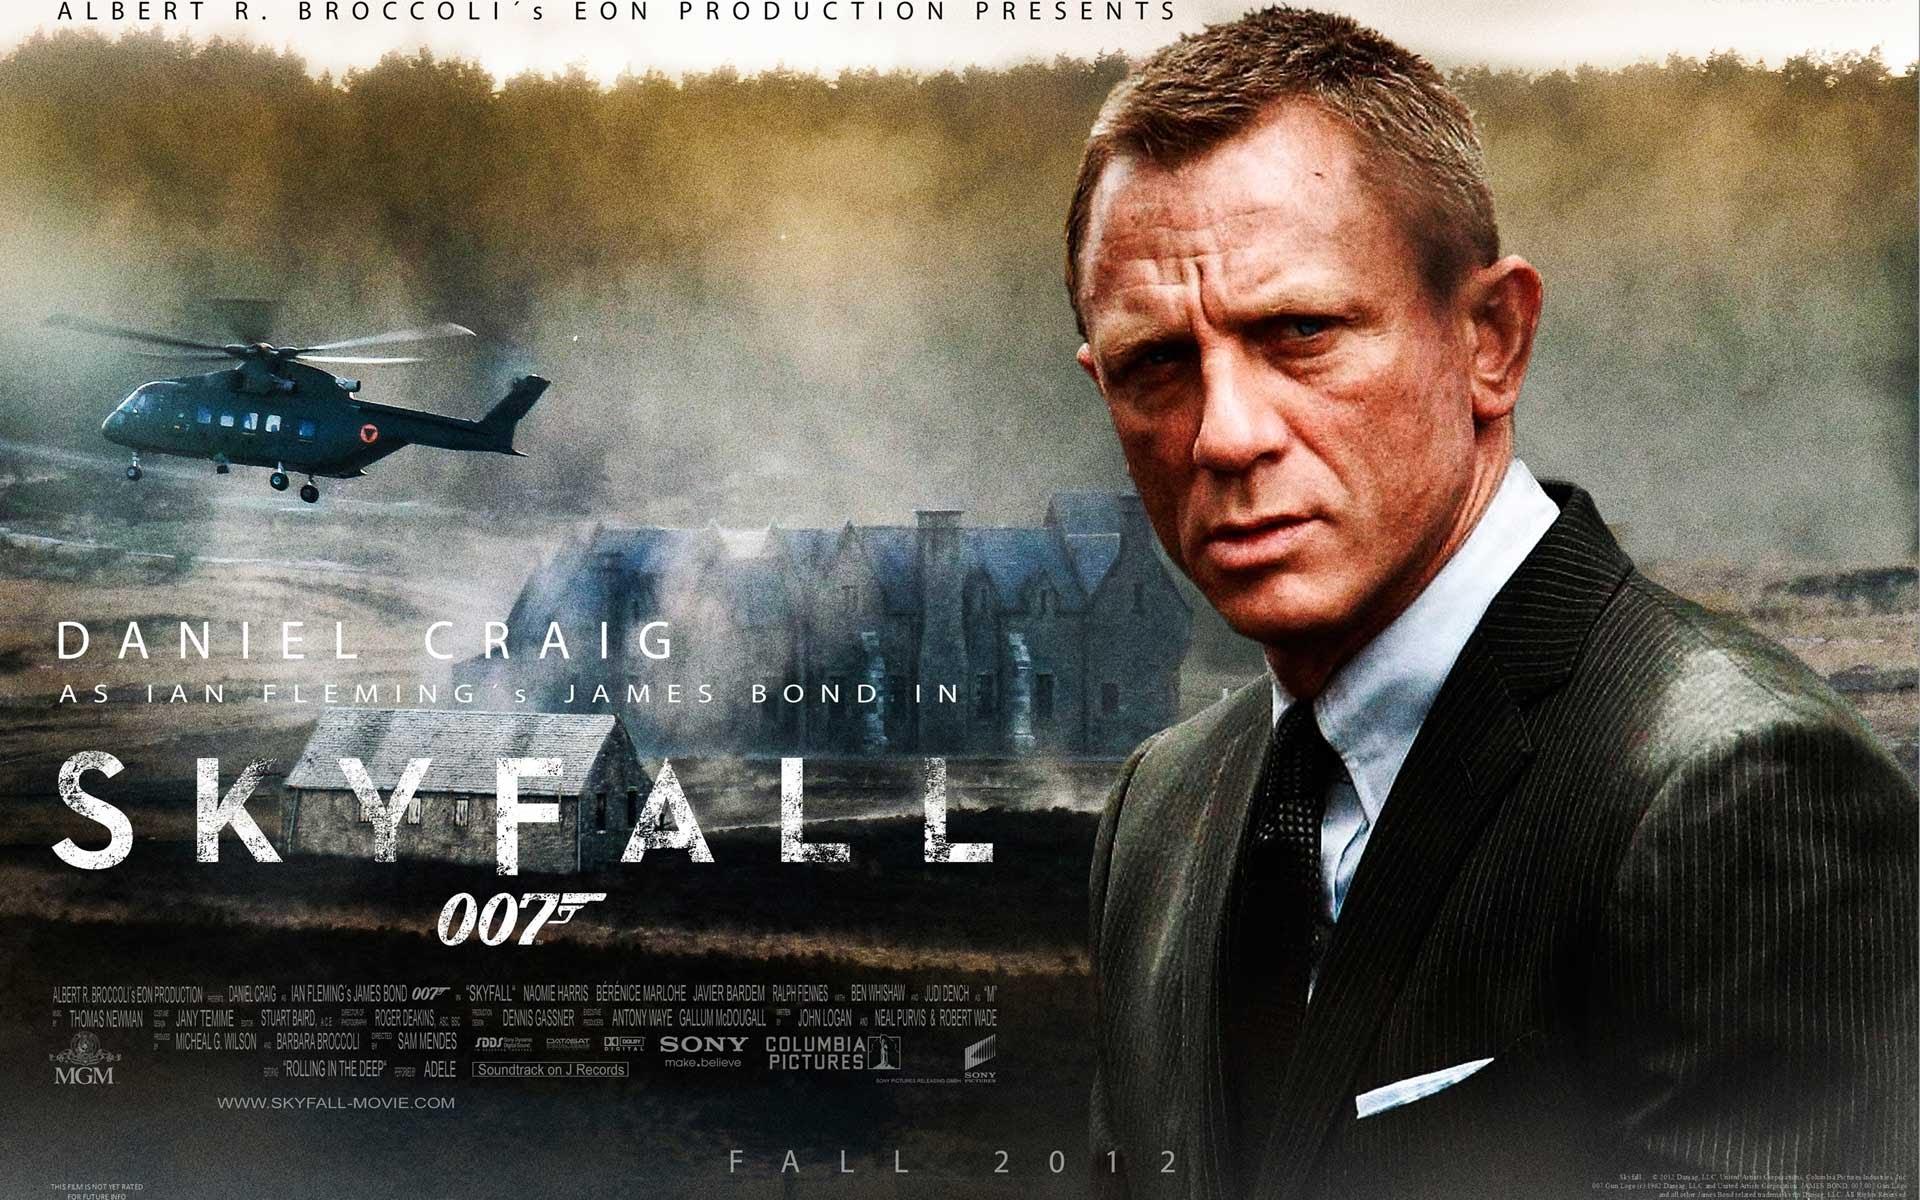 Agent 007: Skyfall (2012)